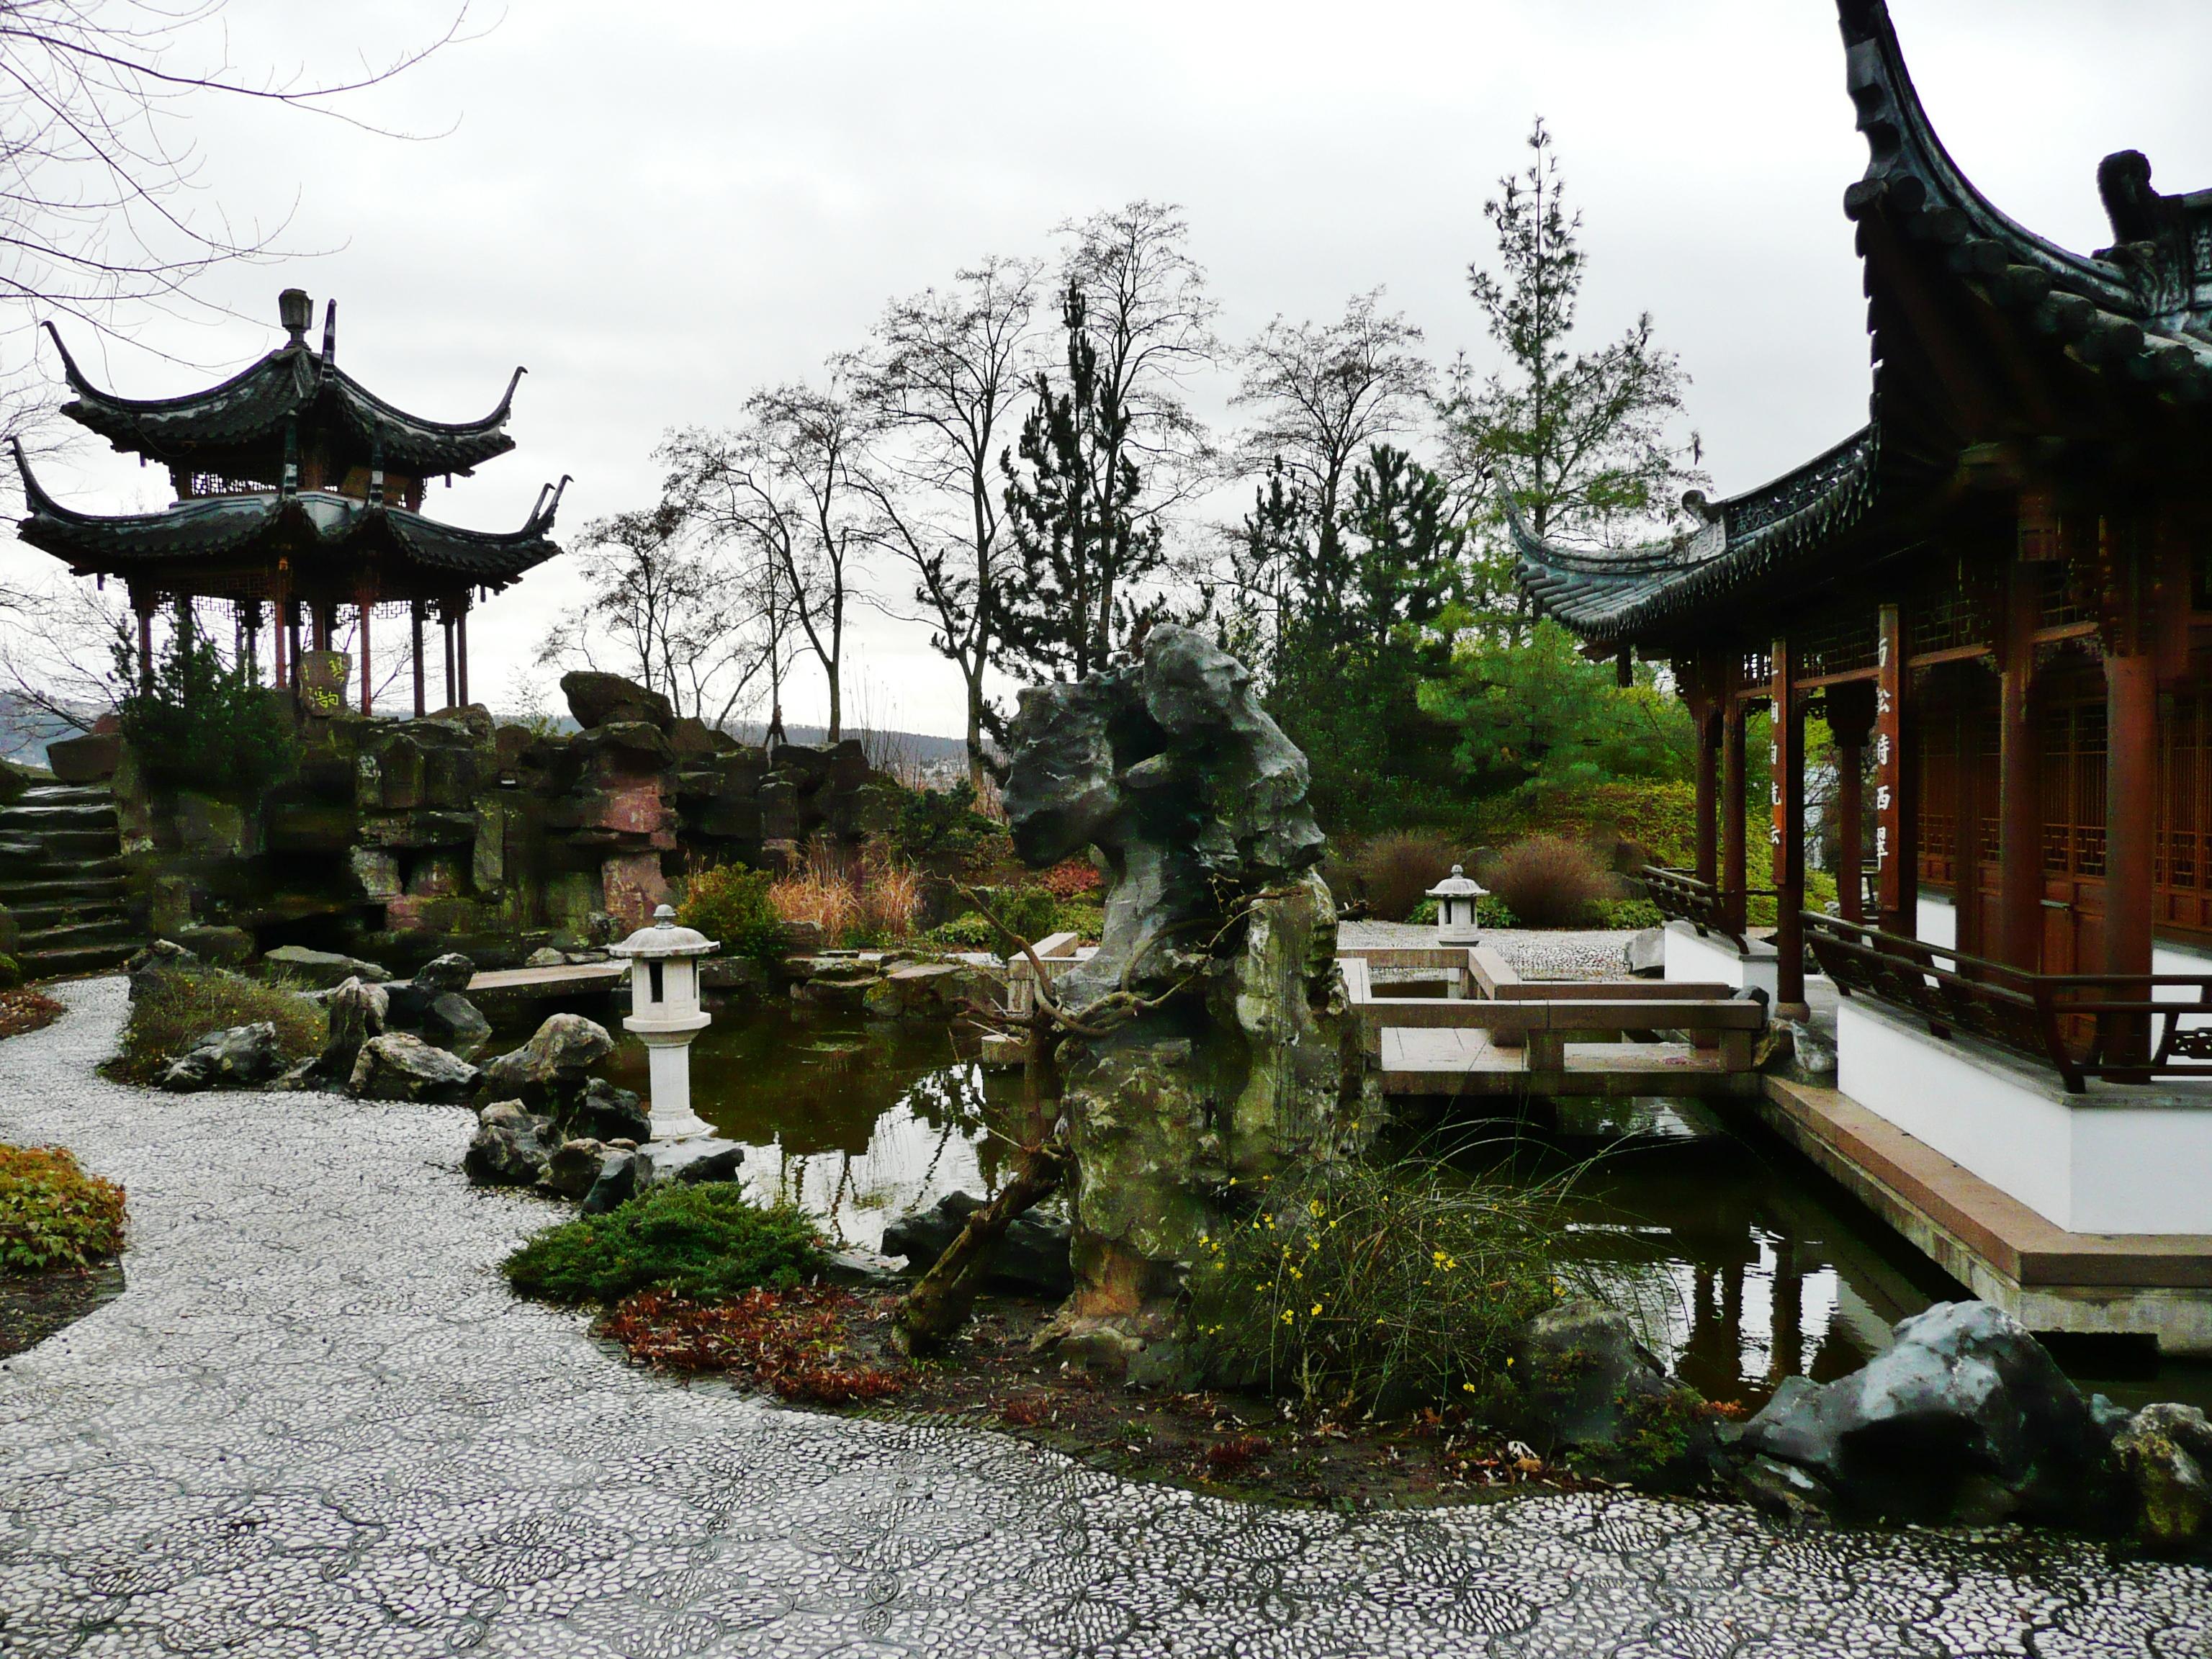 file chinesischer garten qingyin garden 1993 1996 in. Black Bedroom Furniture Sets. Home Design Ideas